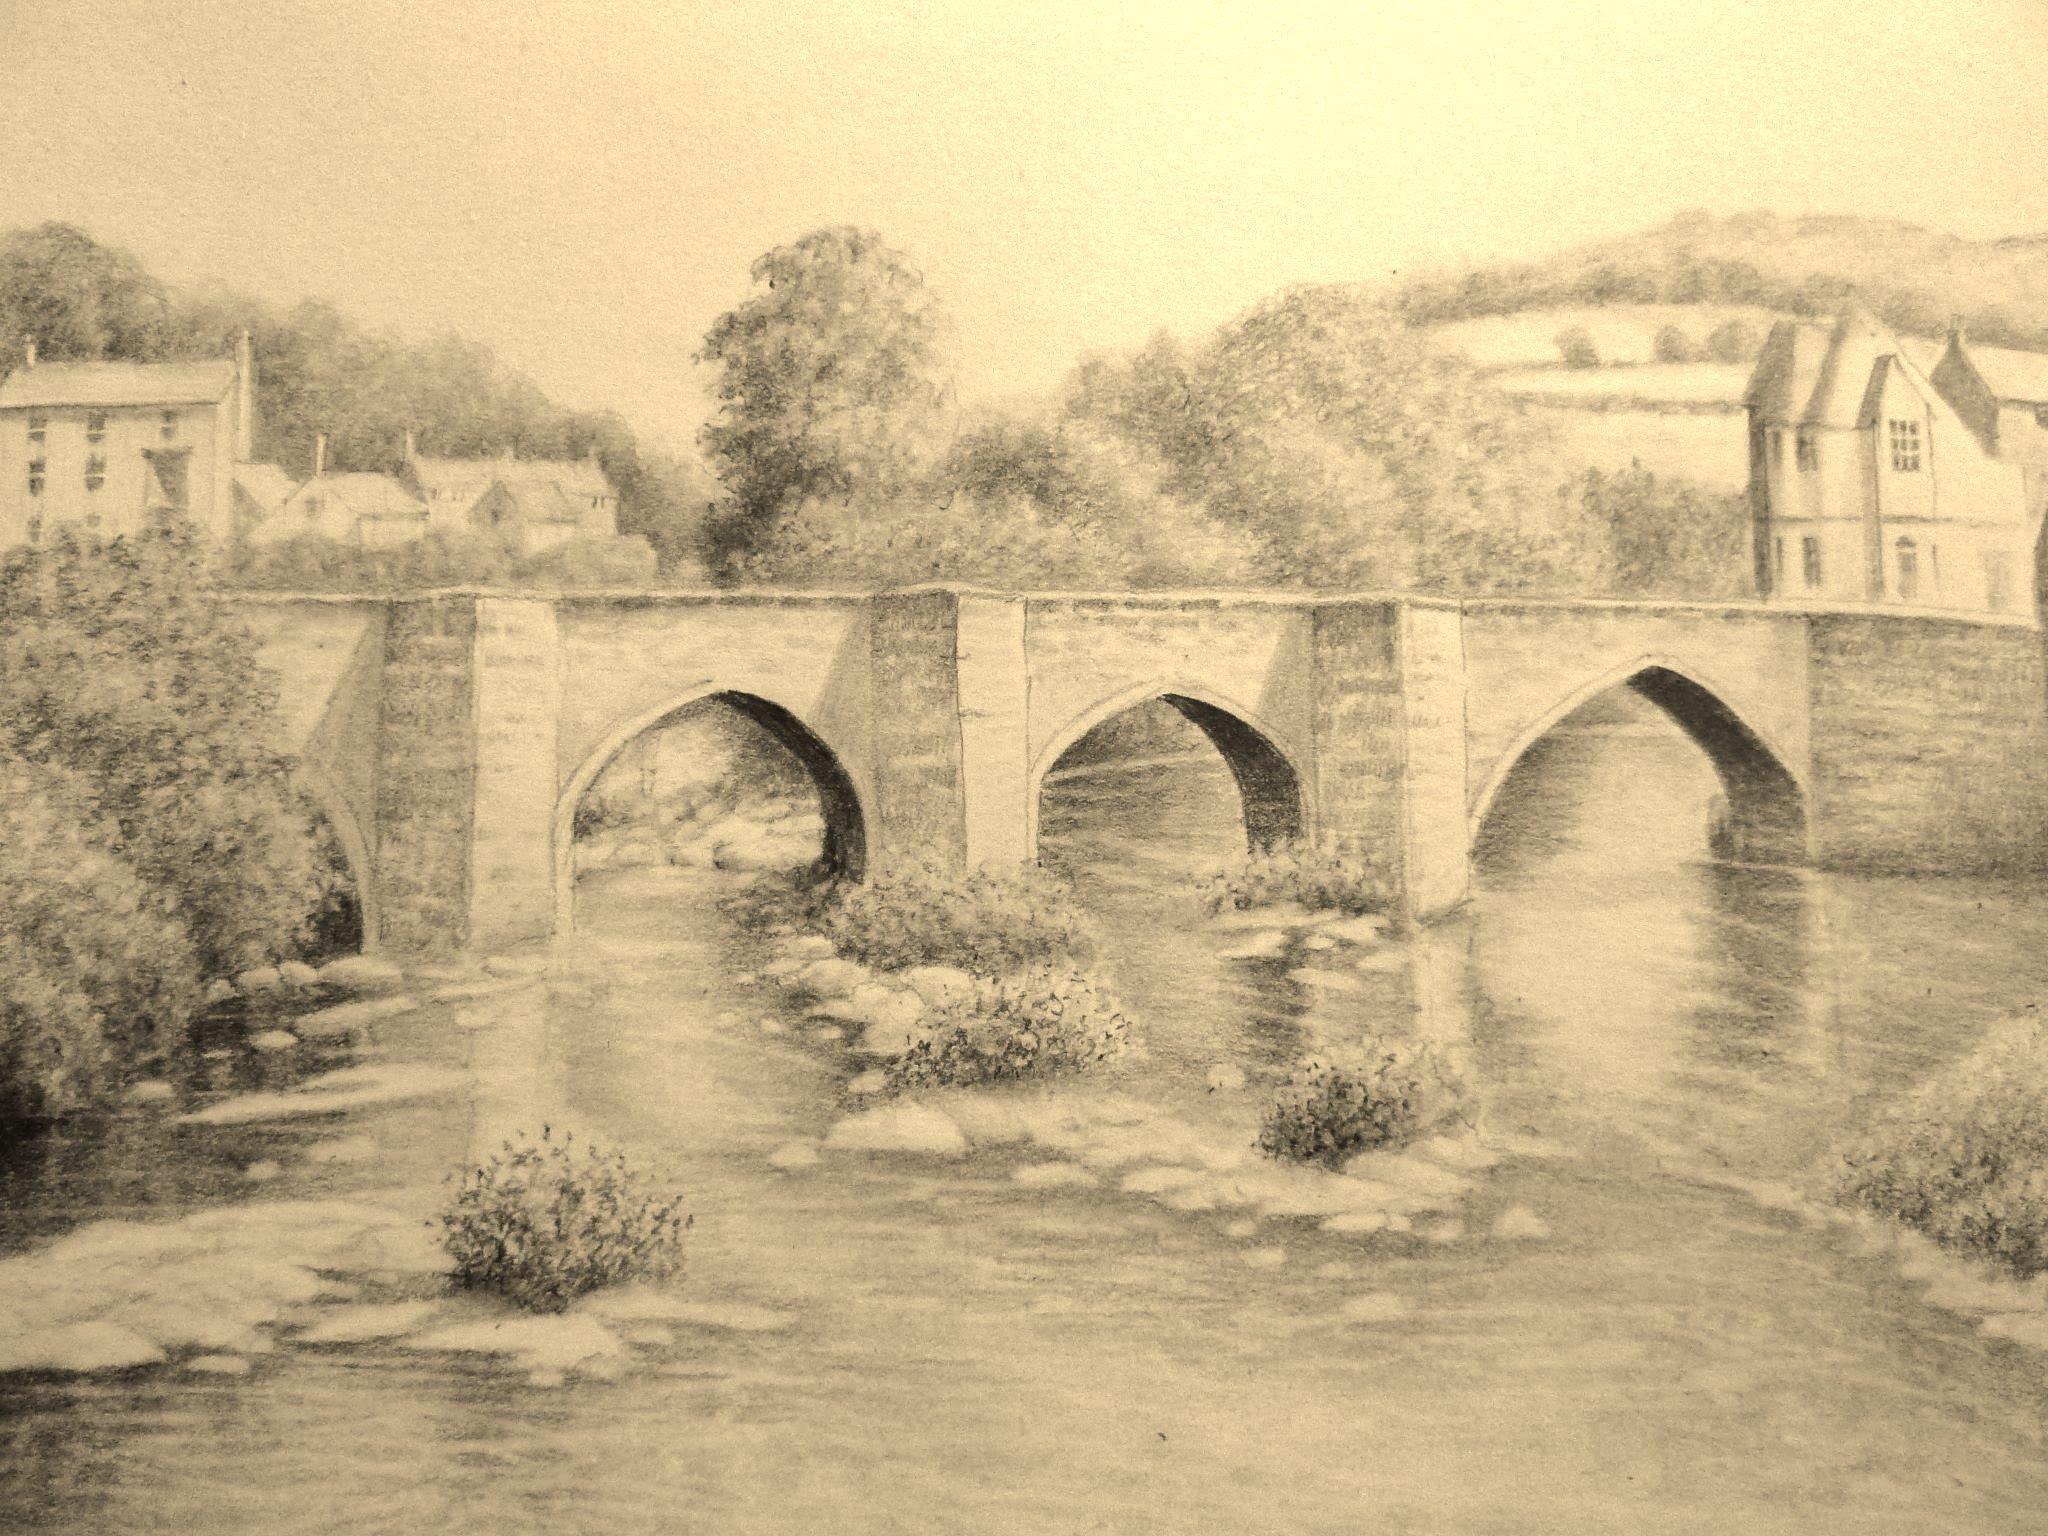 2048x1536 Landscape Graphite Pencil Drawing, Llangollen Bridge, Wales